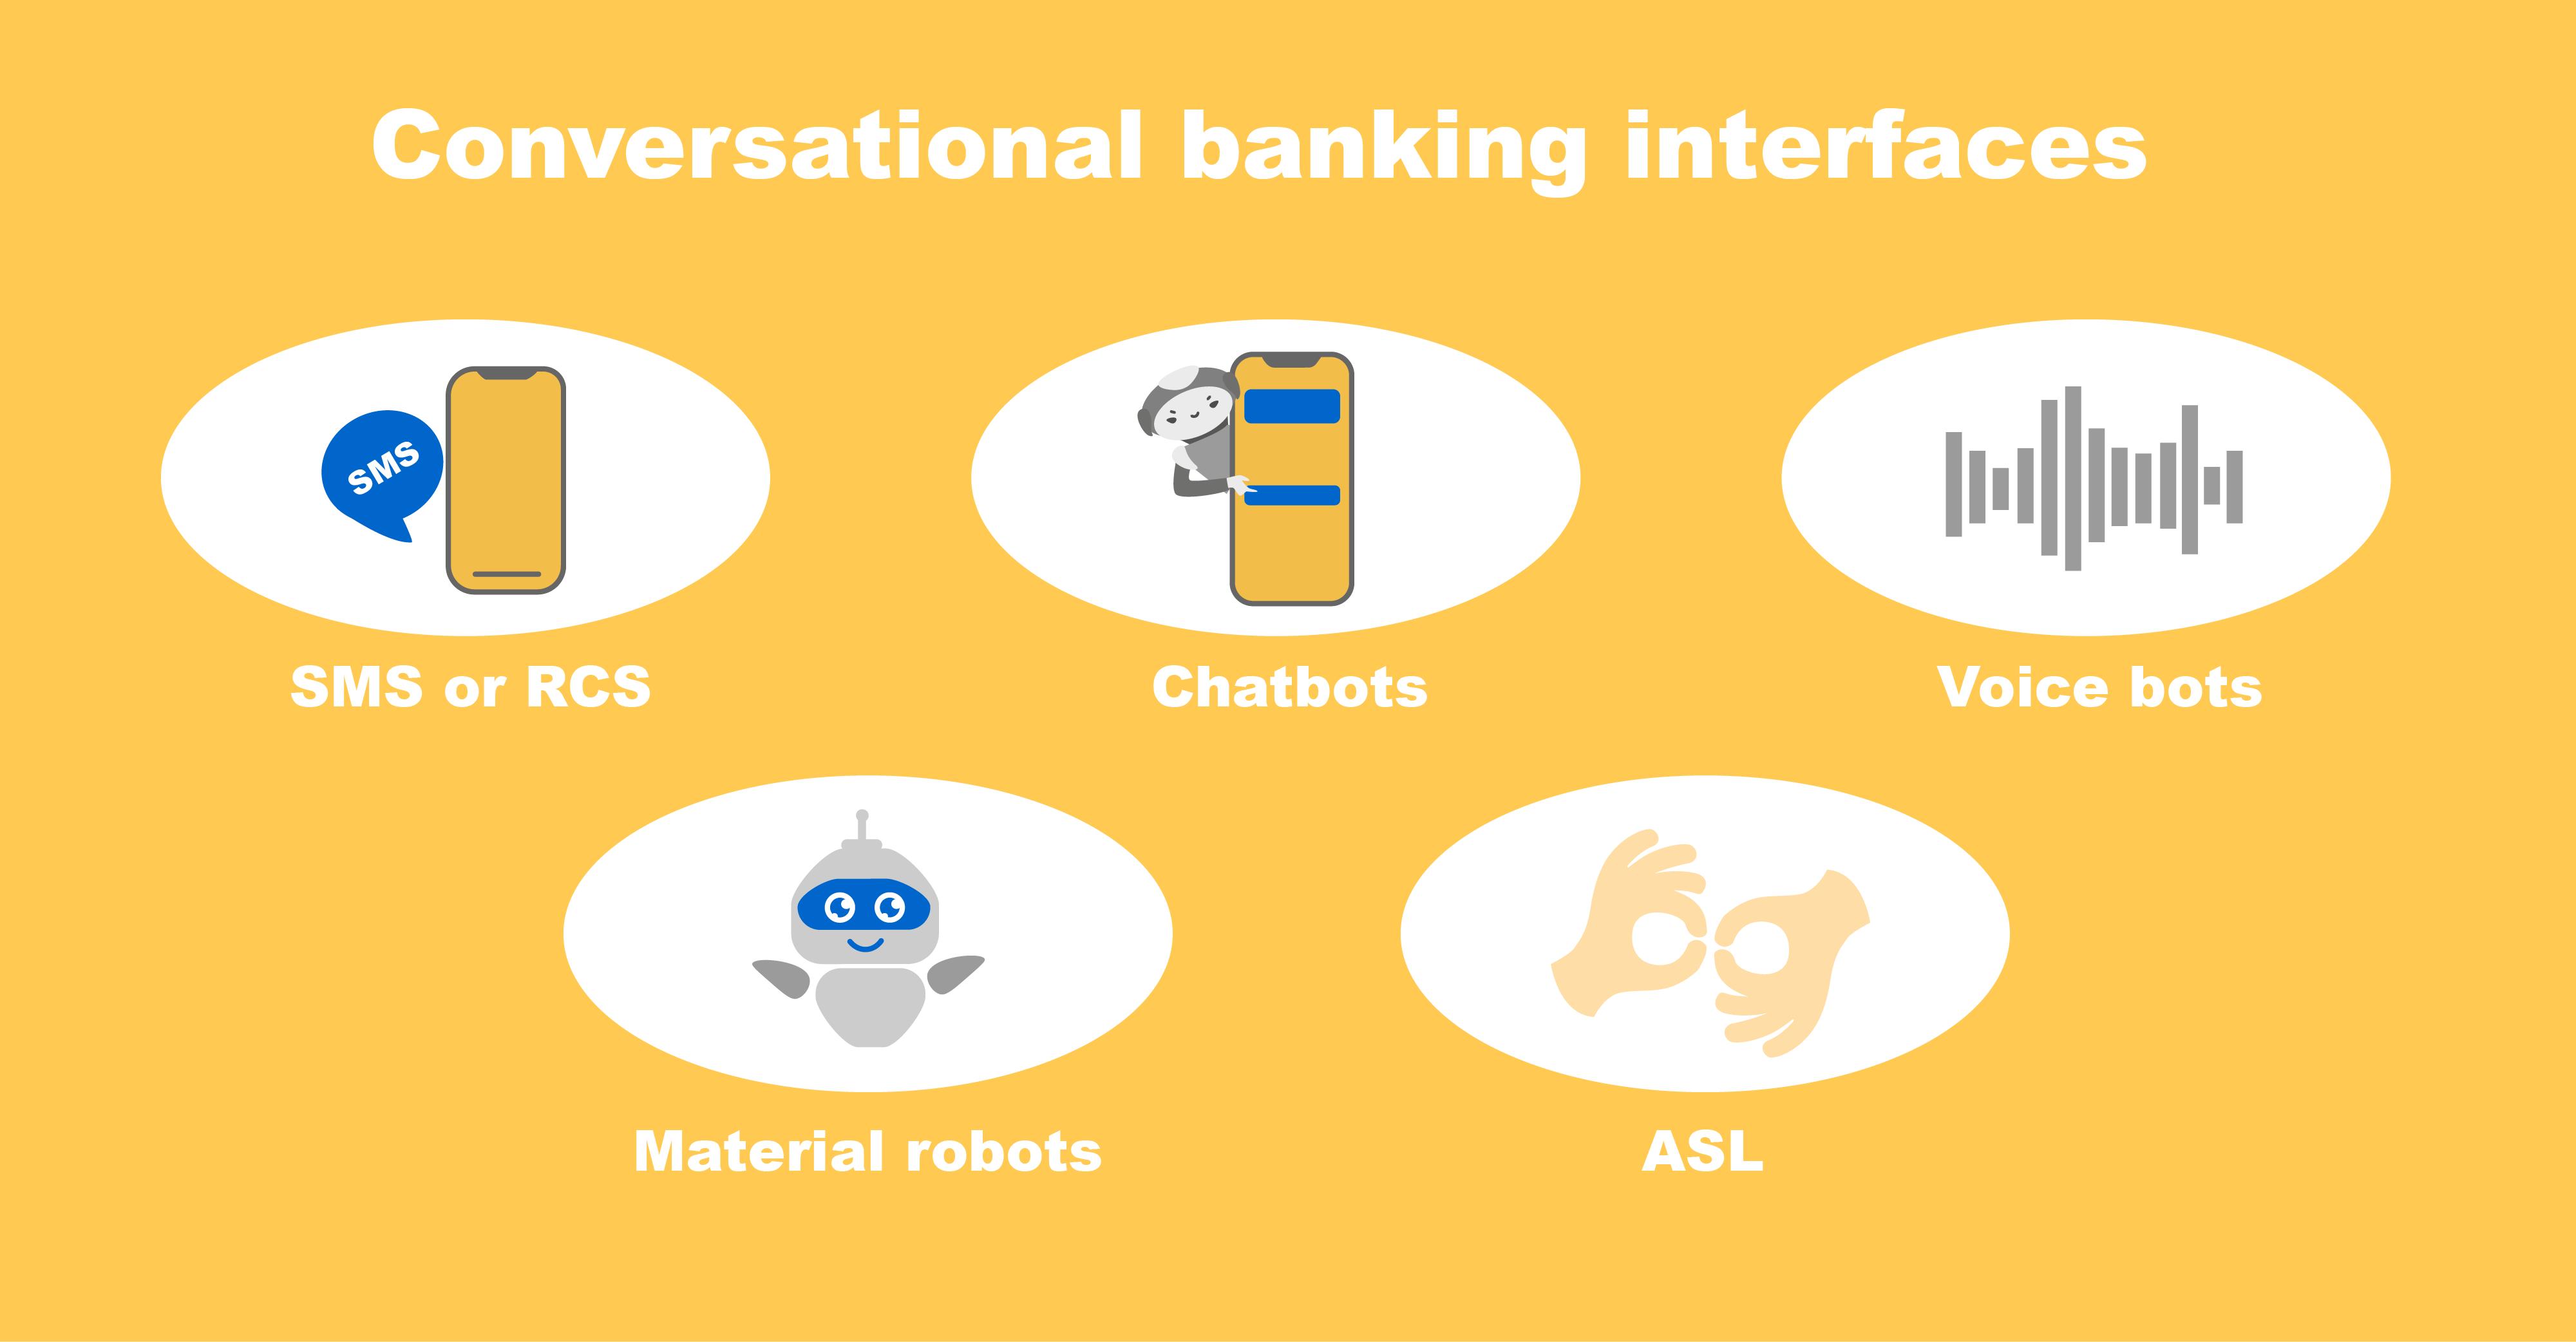 Conversational banking interfaces